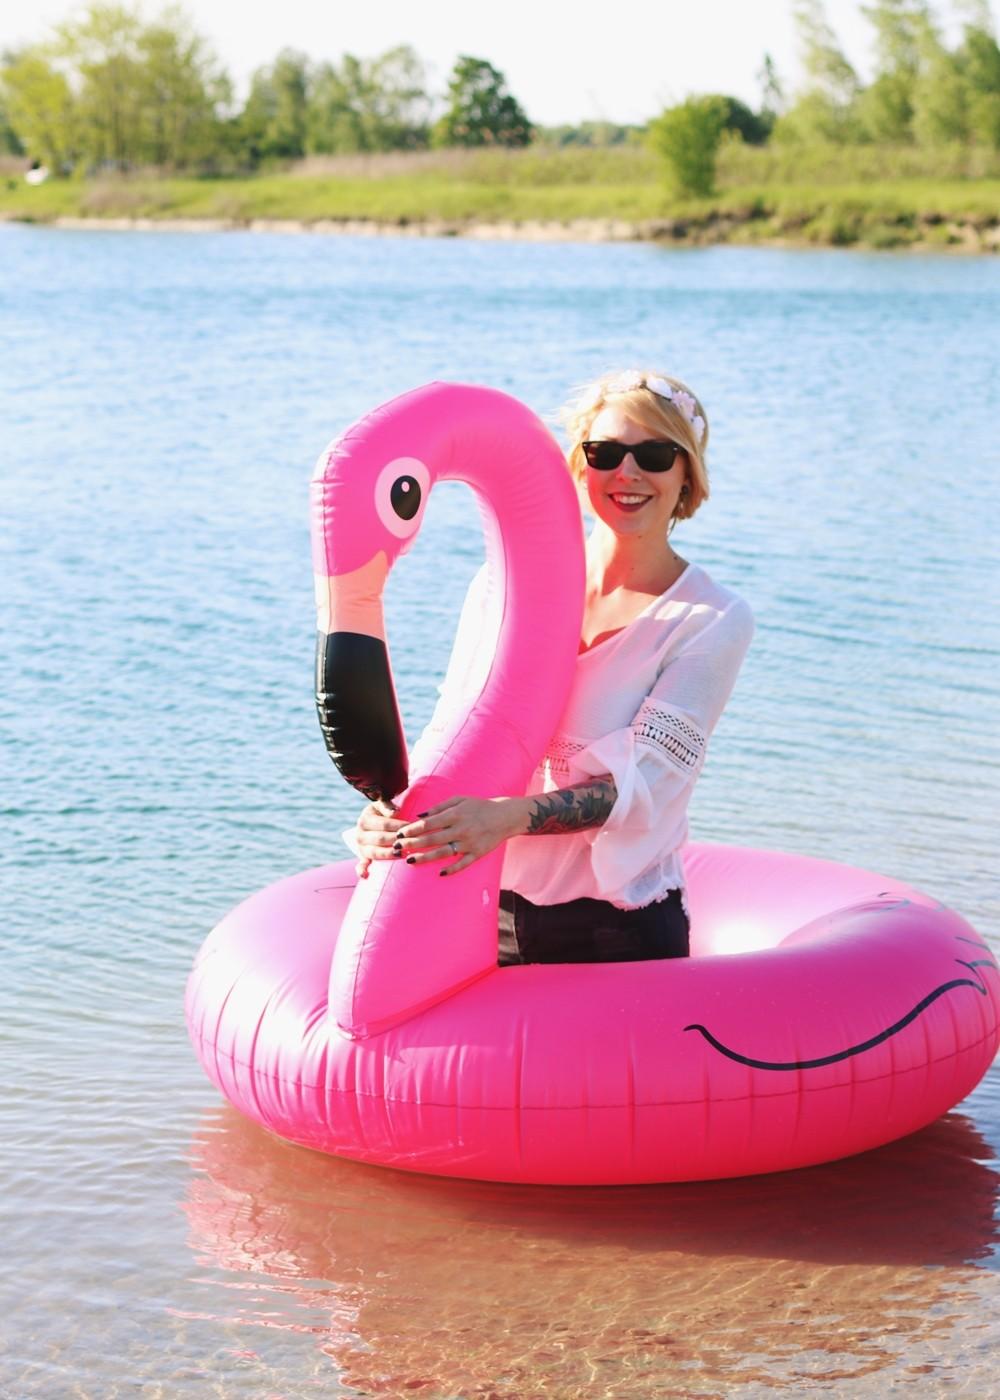 Flamingoschwimmring Donutstrandtuch Accessoires See Strand Radbag (13)